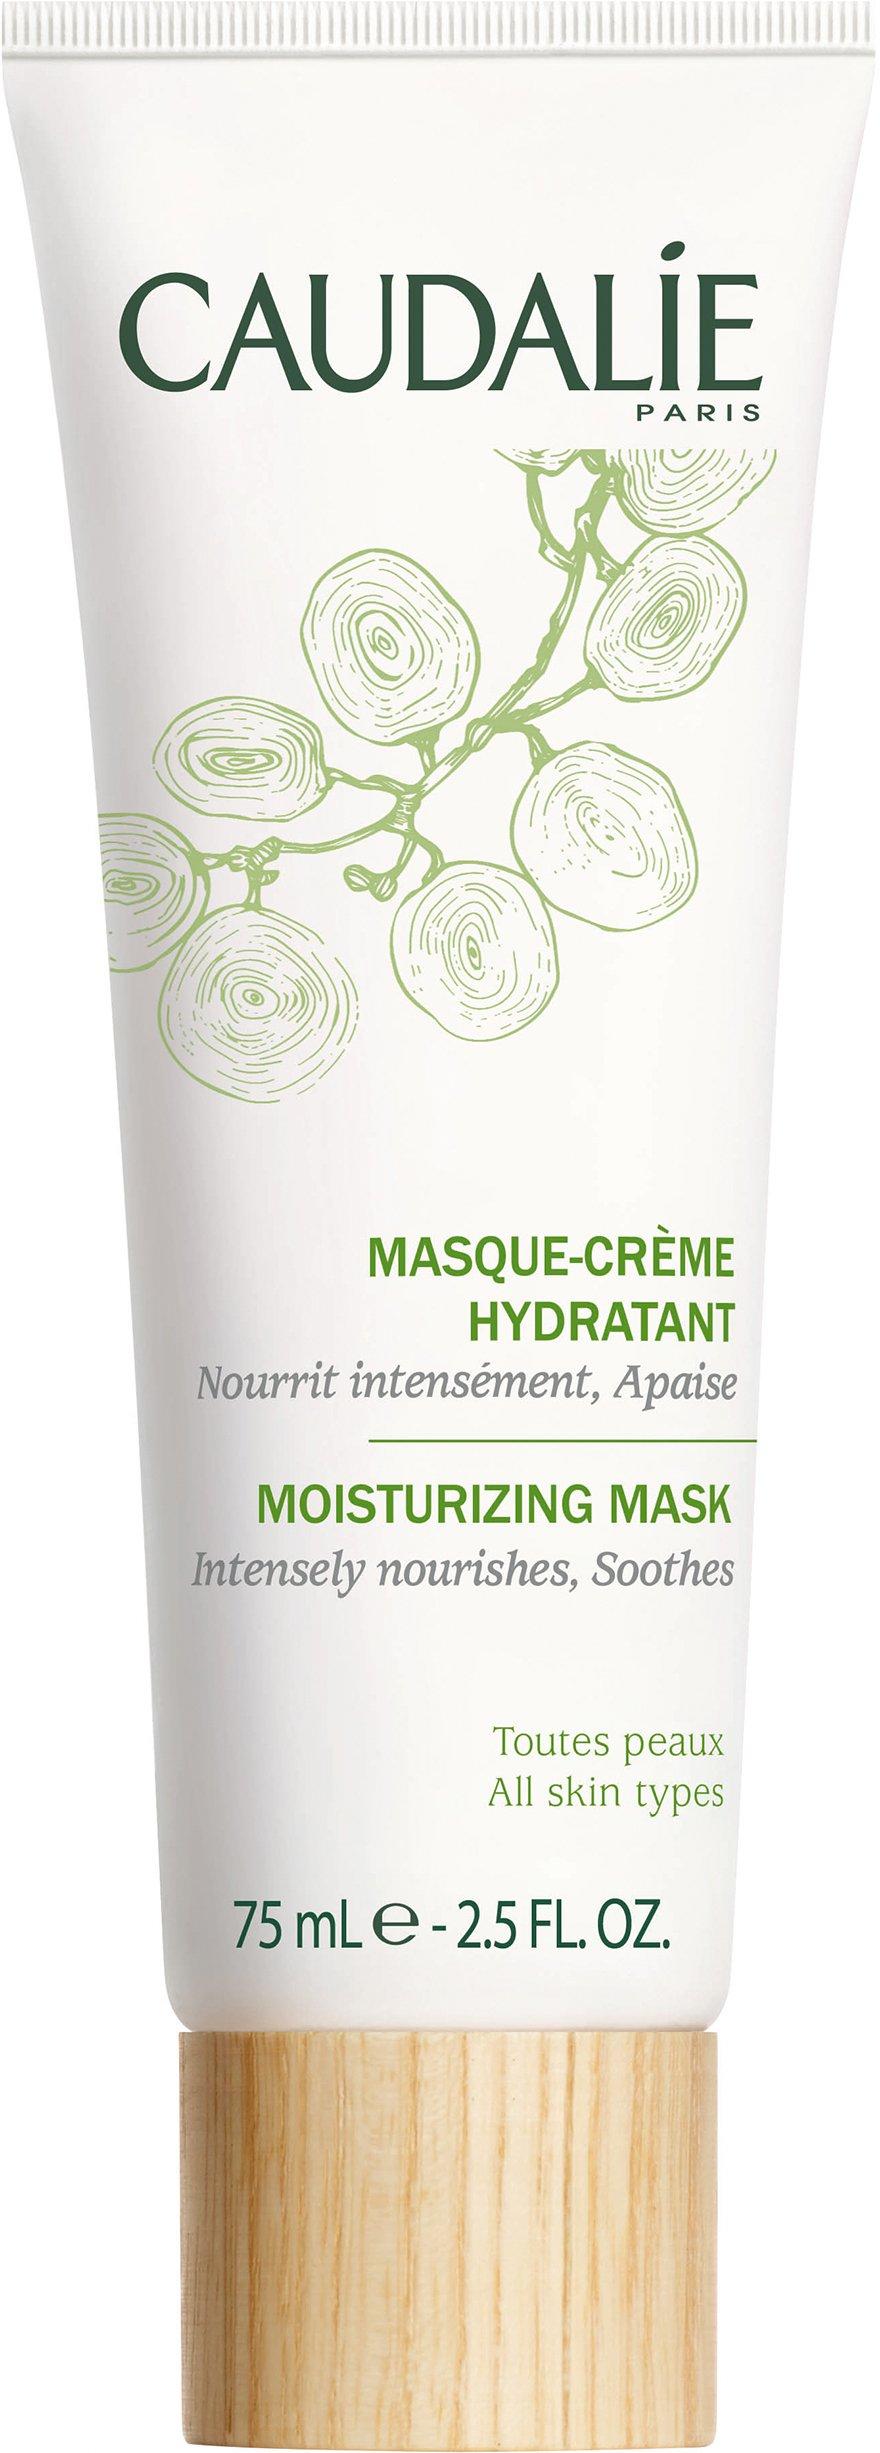 Caudalie - Moisturizing Mask 75 ml